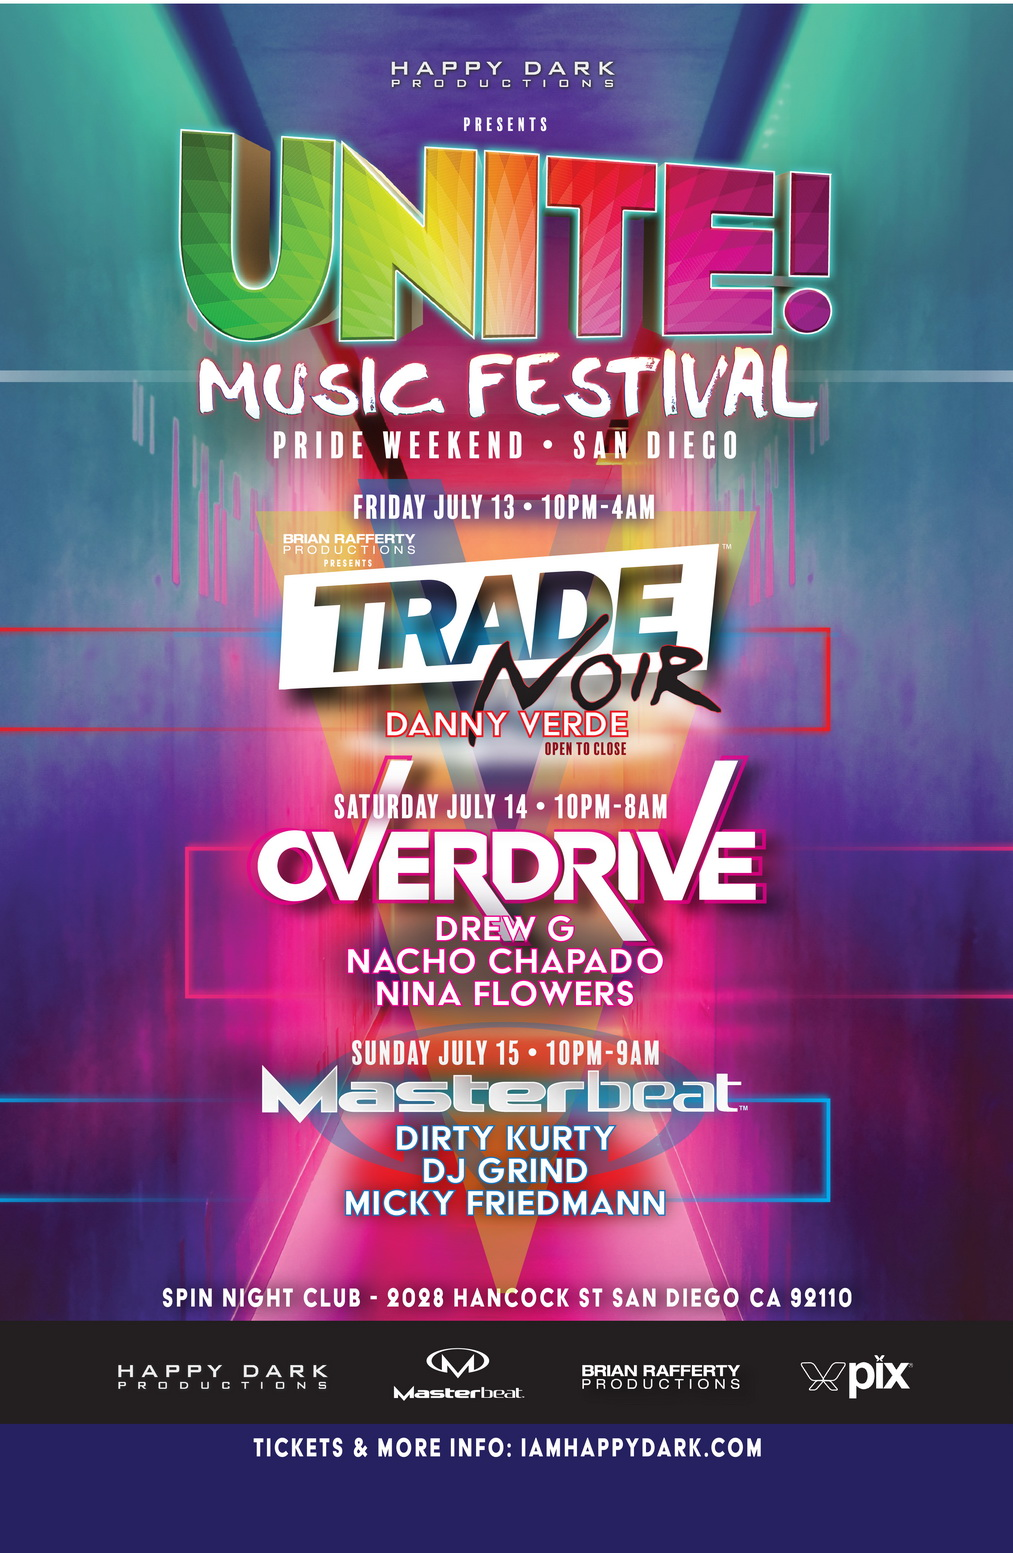 UNITE! Music Festival 2018 Lineup